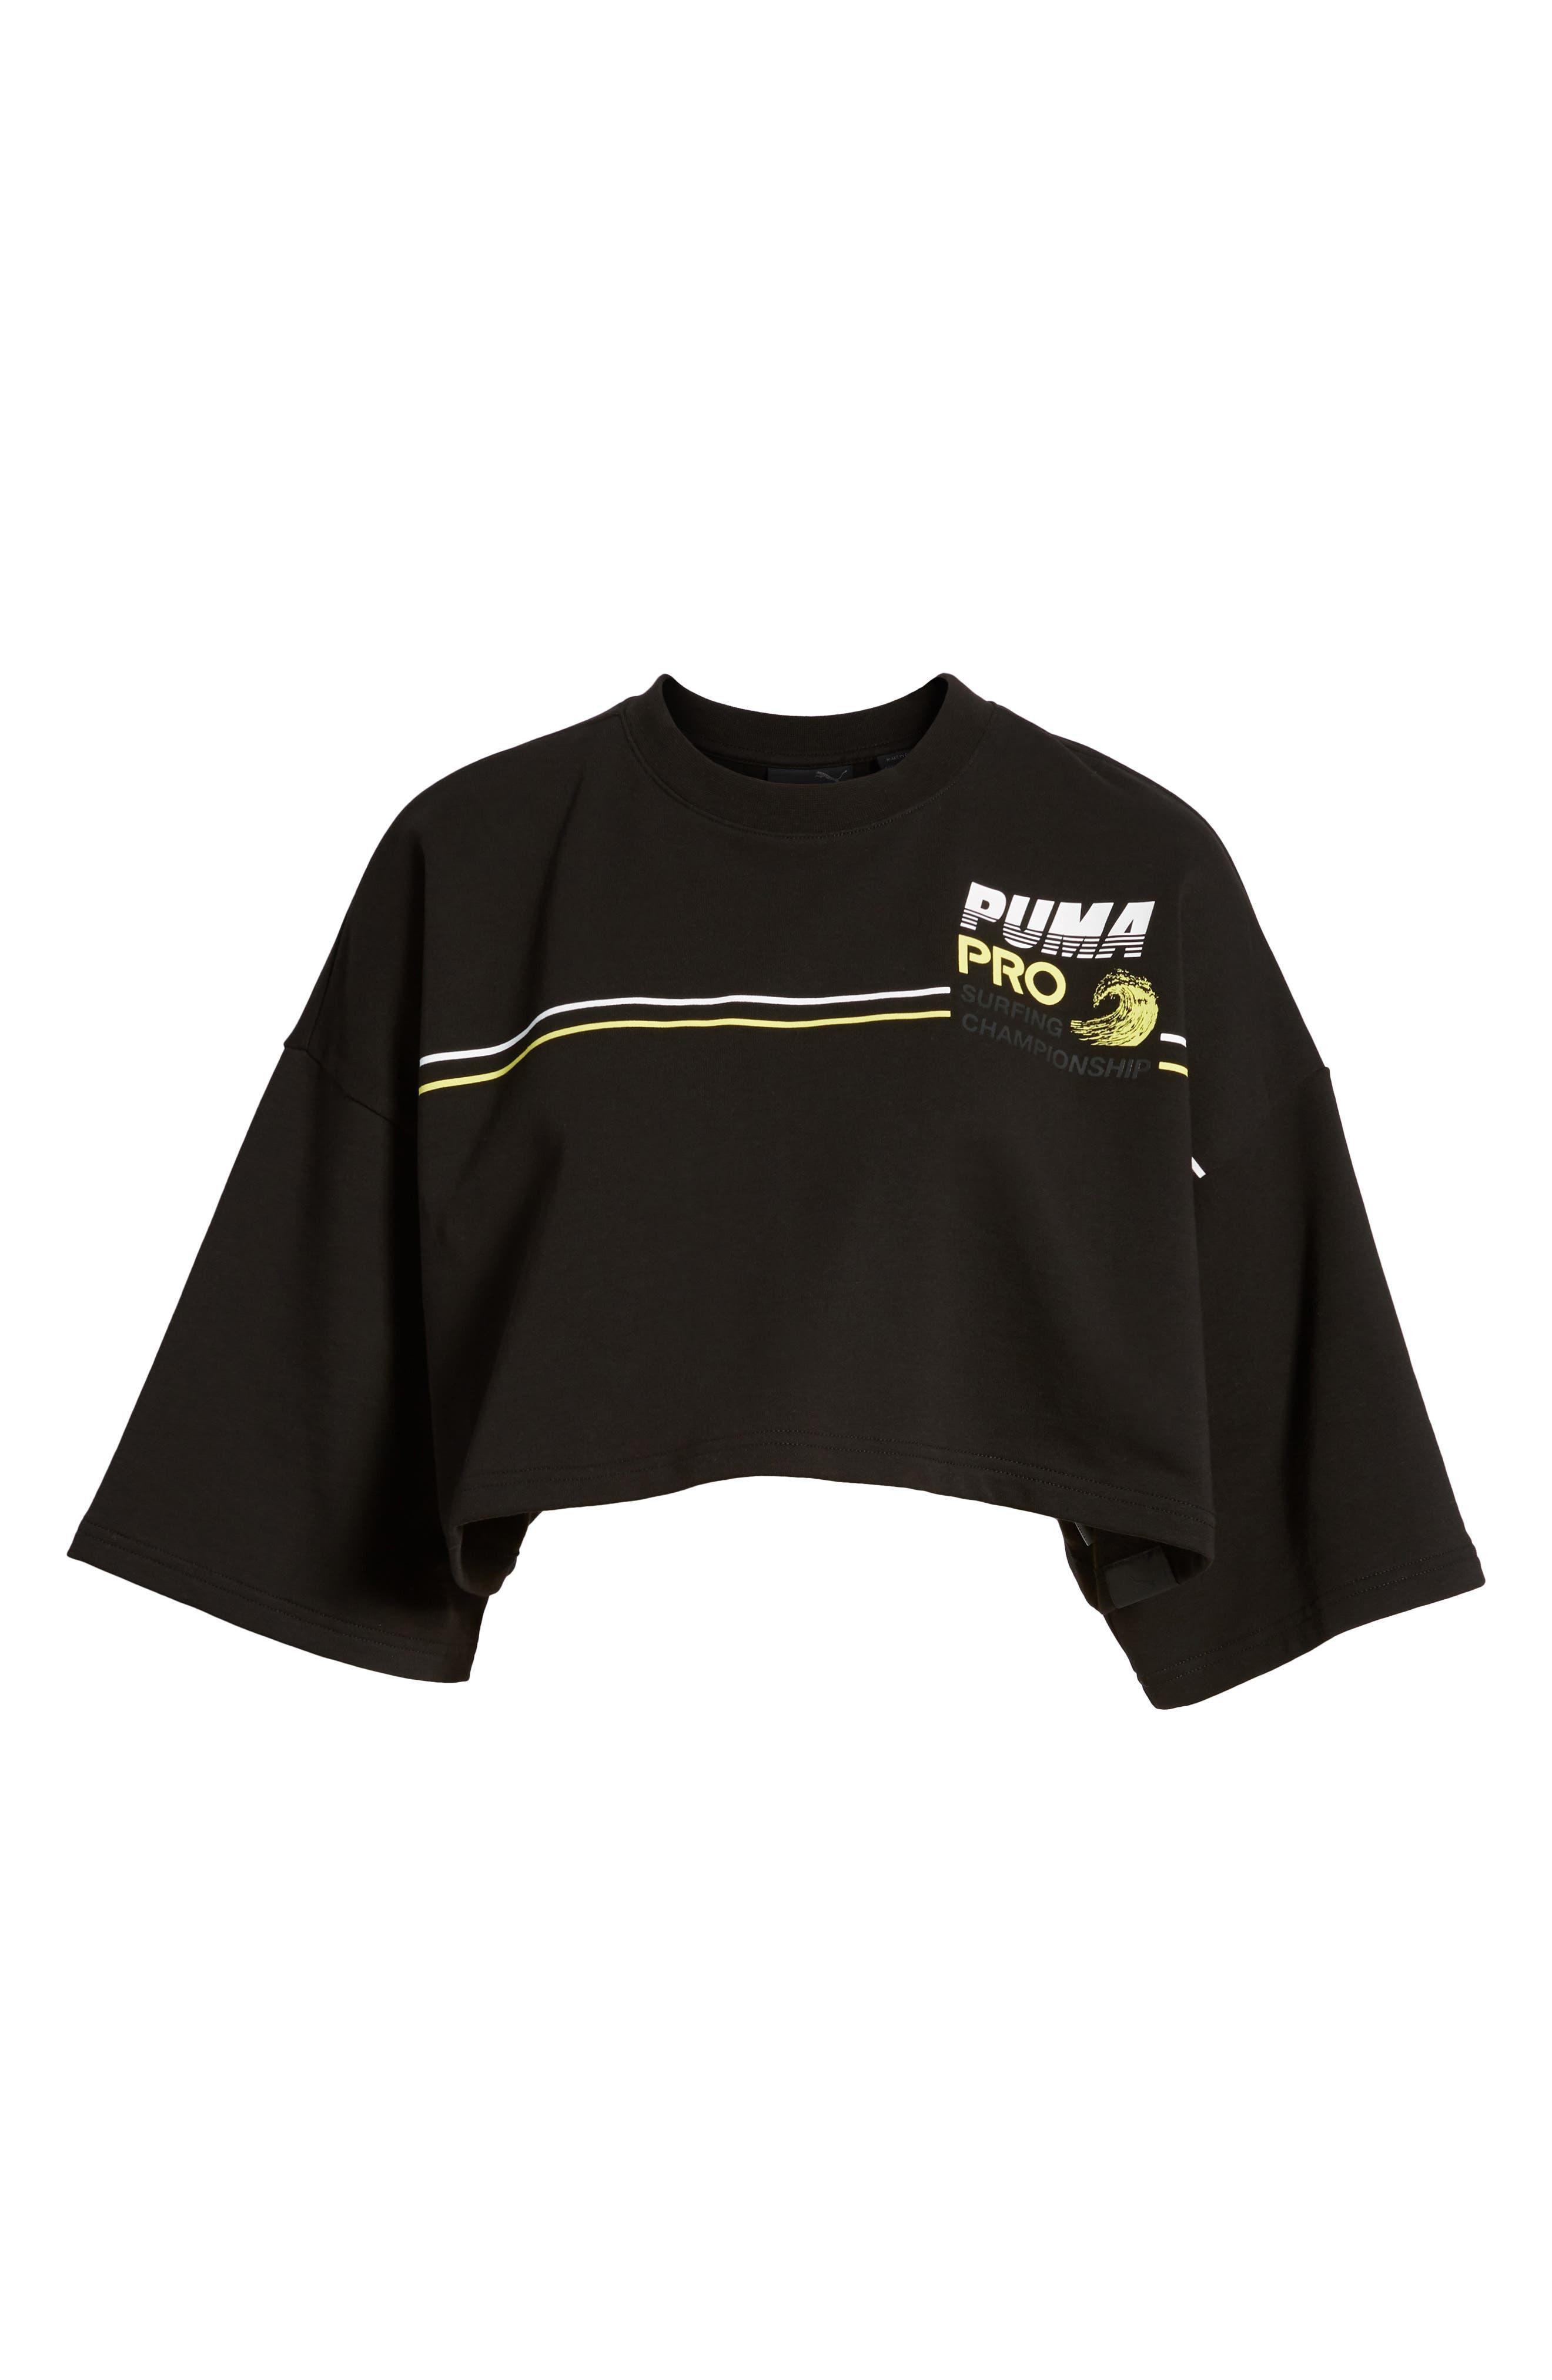 PUMA by Rihanna Graphic Short Sleeve Crop Sweatshirt,                             Alternate thumbnail 7, color,                             001